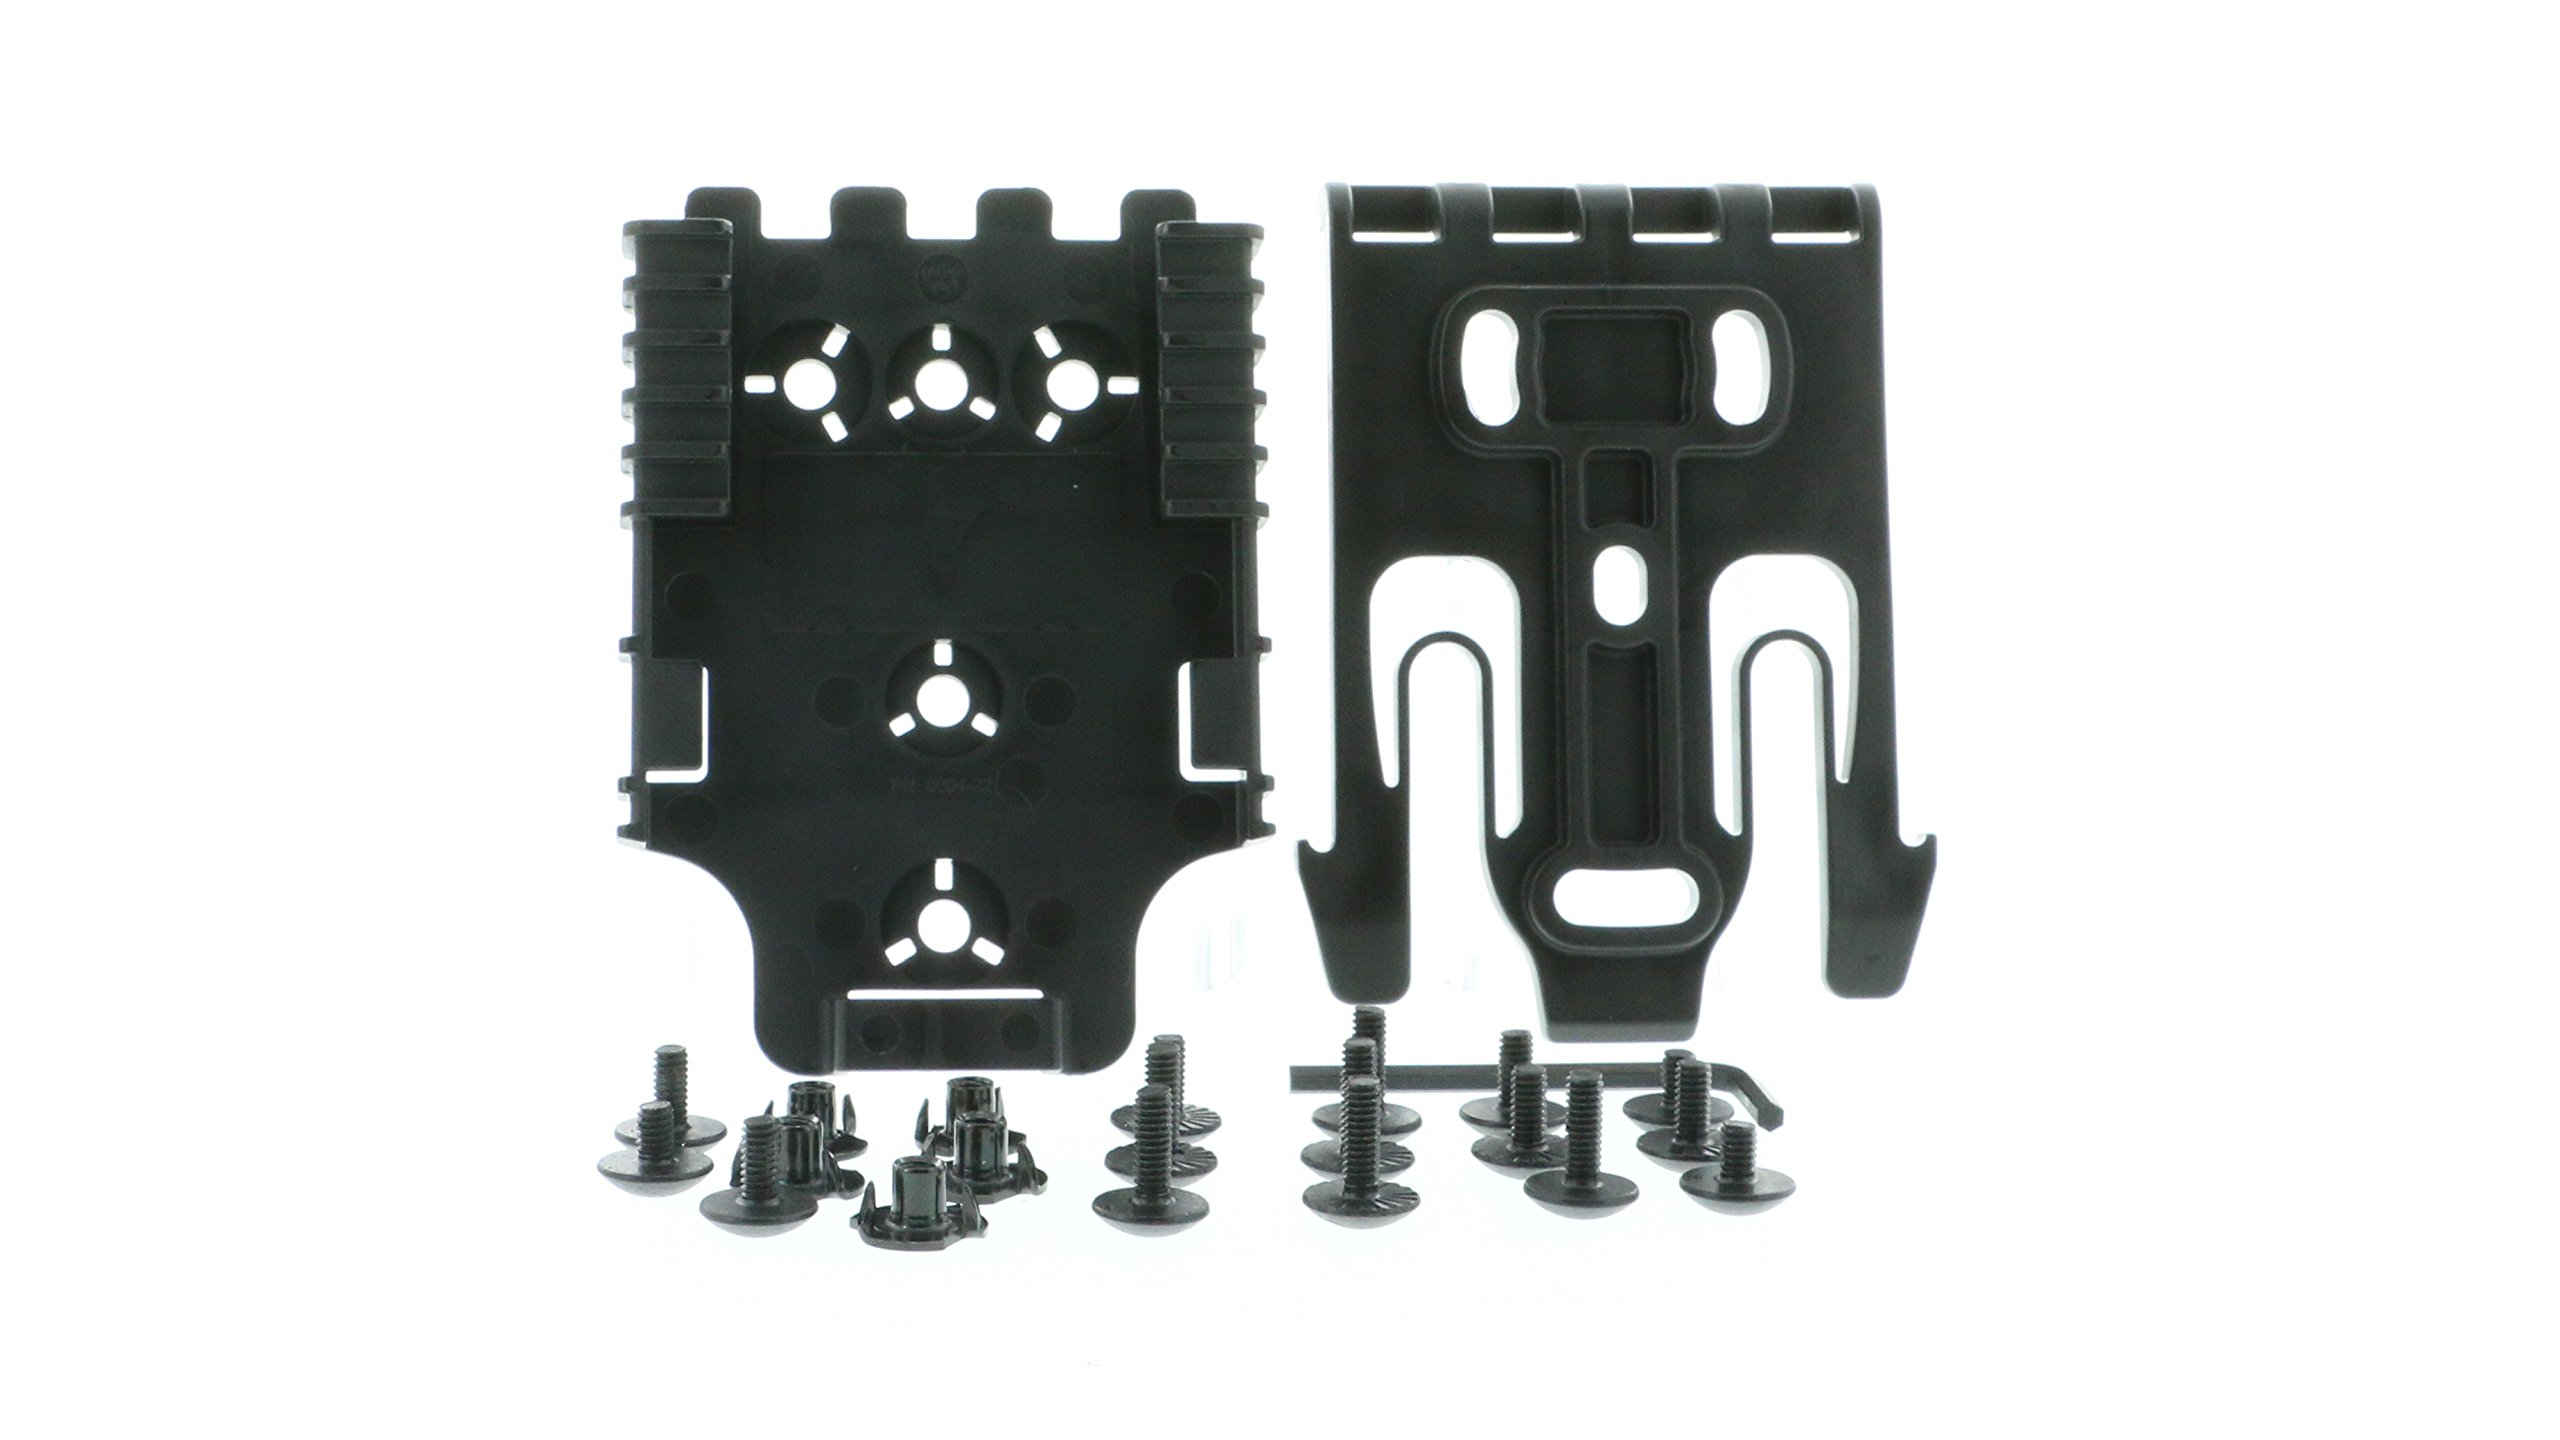 Safariland QLS Kit, (1 ea.) QLS 19 Fork & (2 ea.) QLS 22 Receivers Holsters, Black, Single Kit Only by Safariland